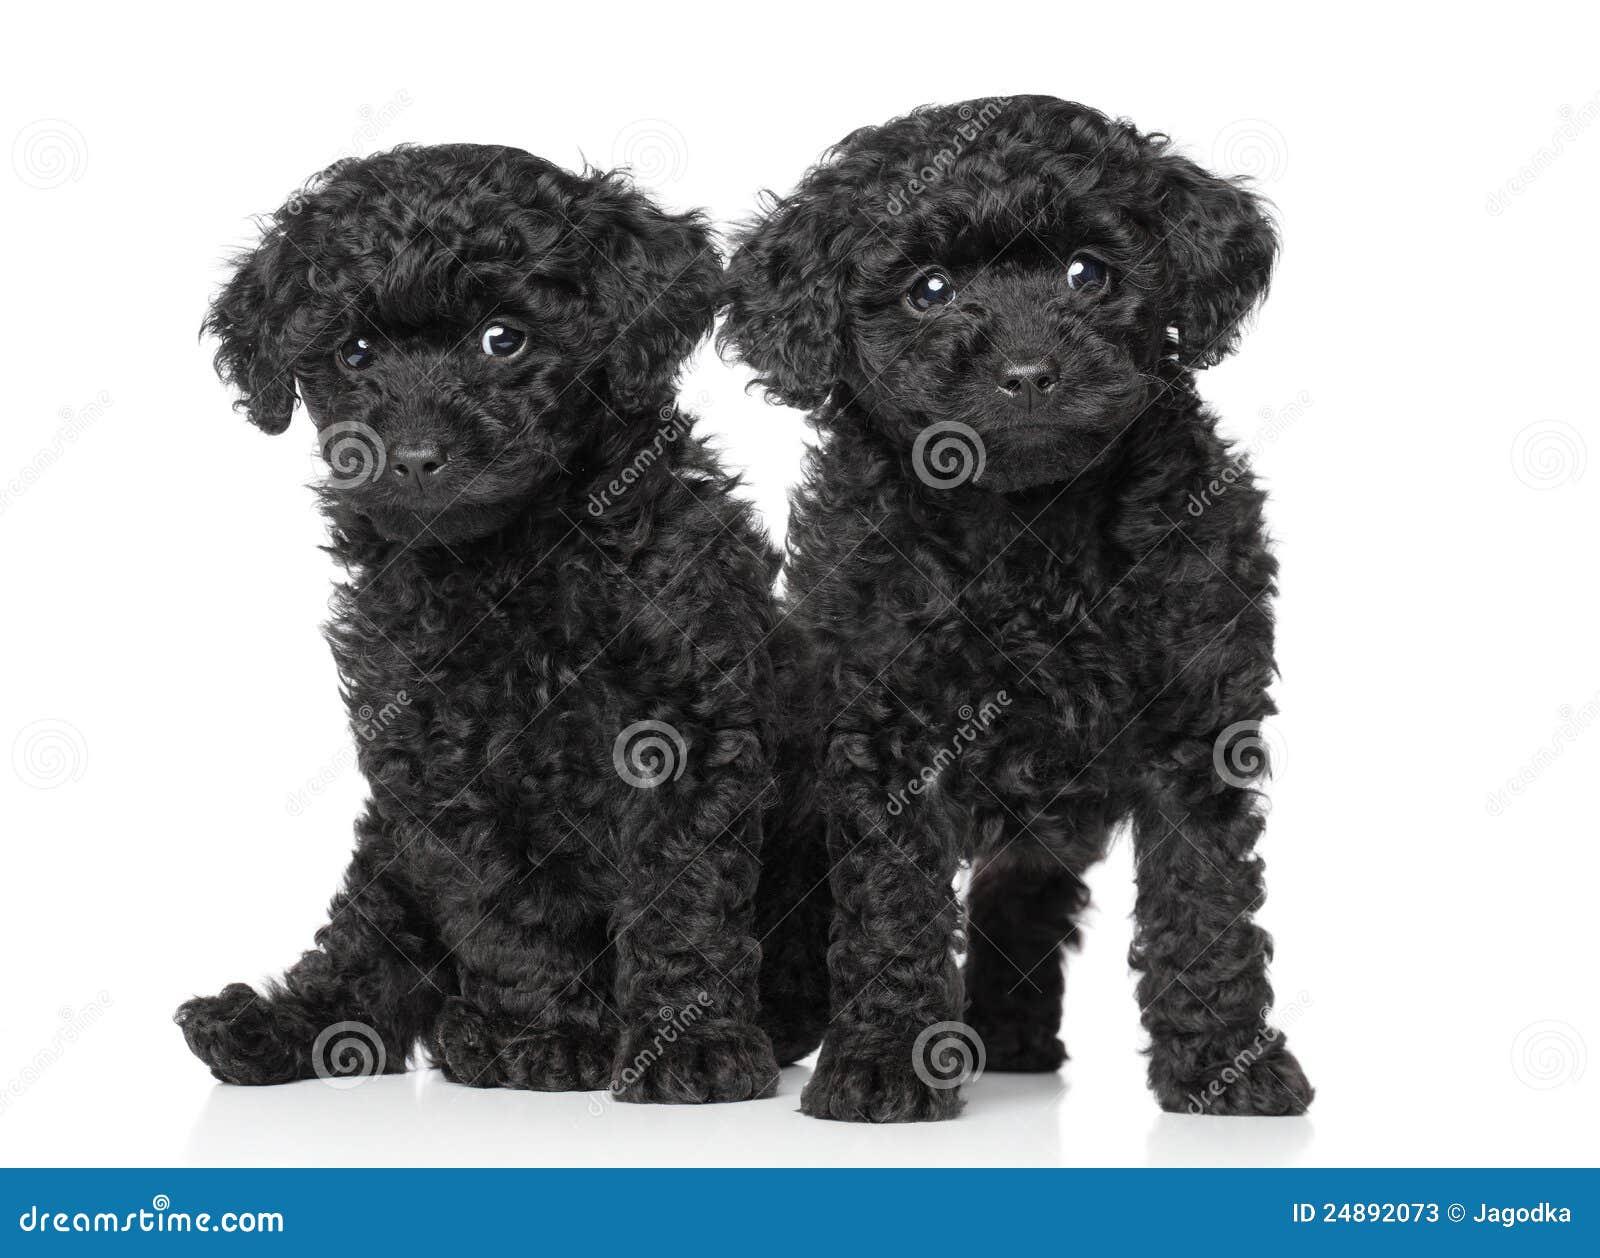 Black Toy Poodle Puppies Stock Image Image Of Studio 24892073